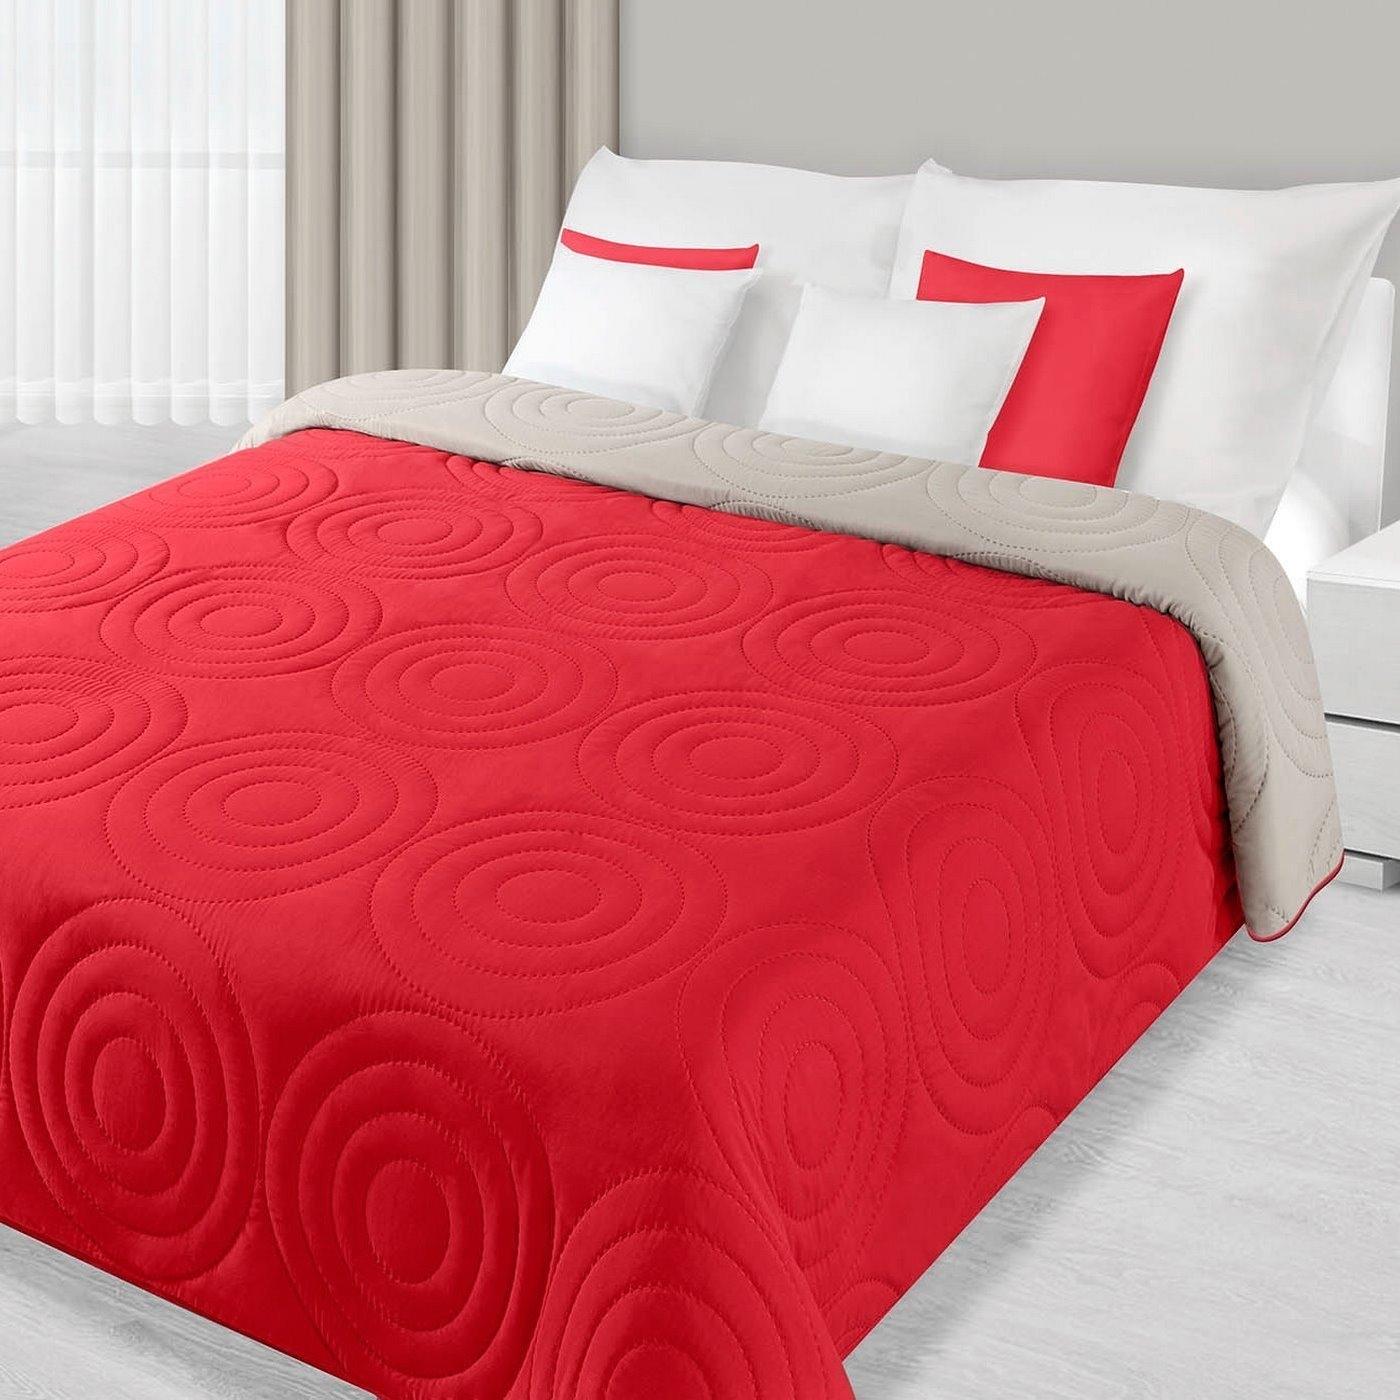 Cuvertura reversibila Alisa Red / Beige 220 x 240 cm